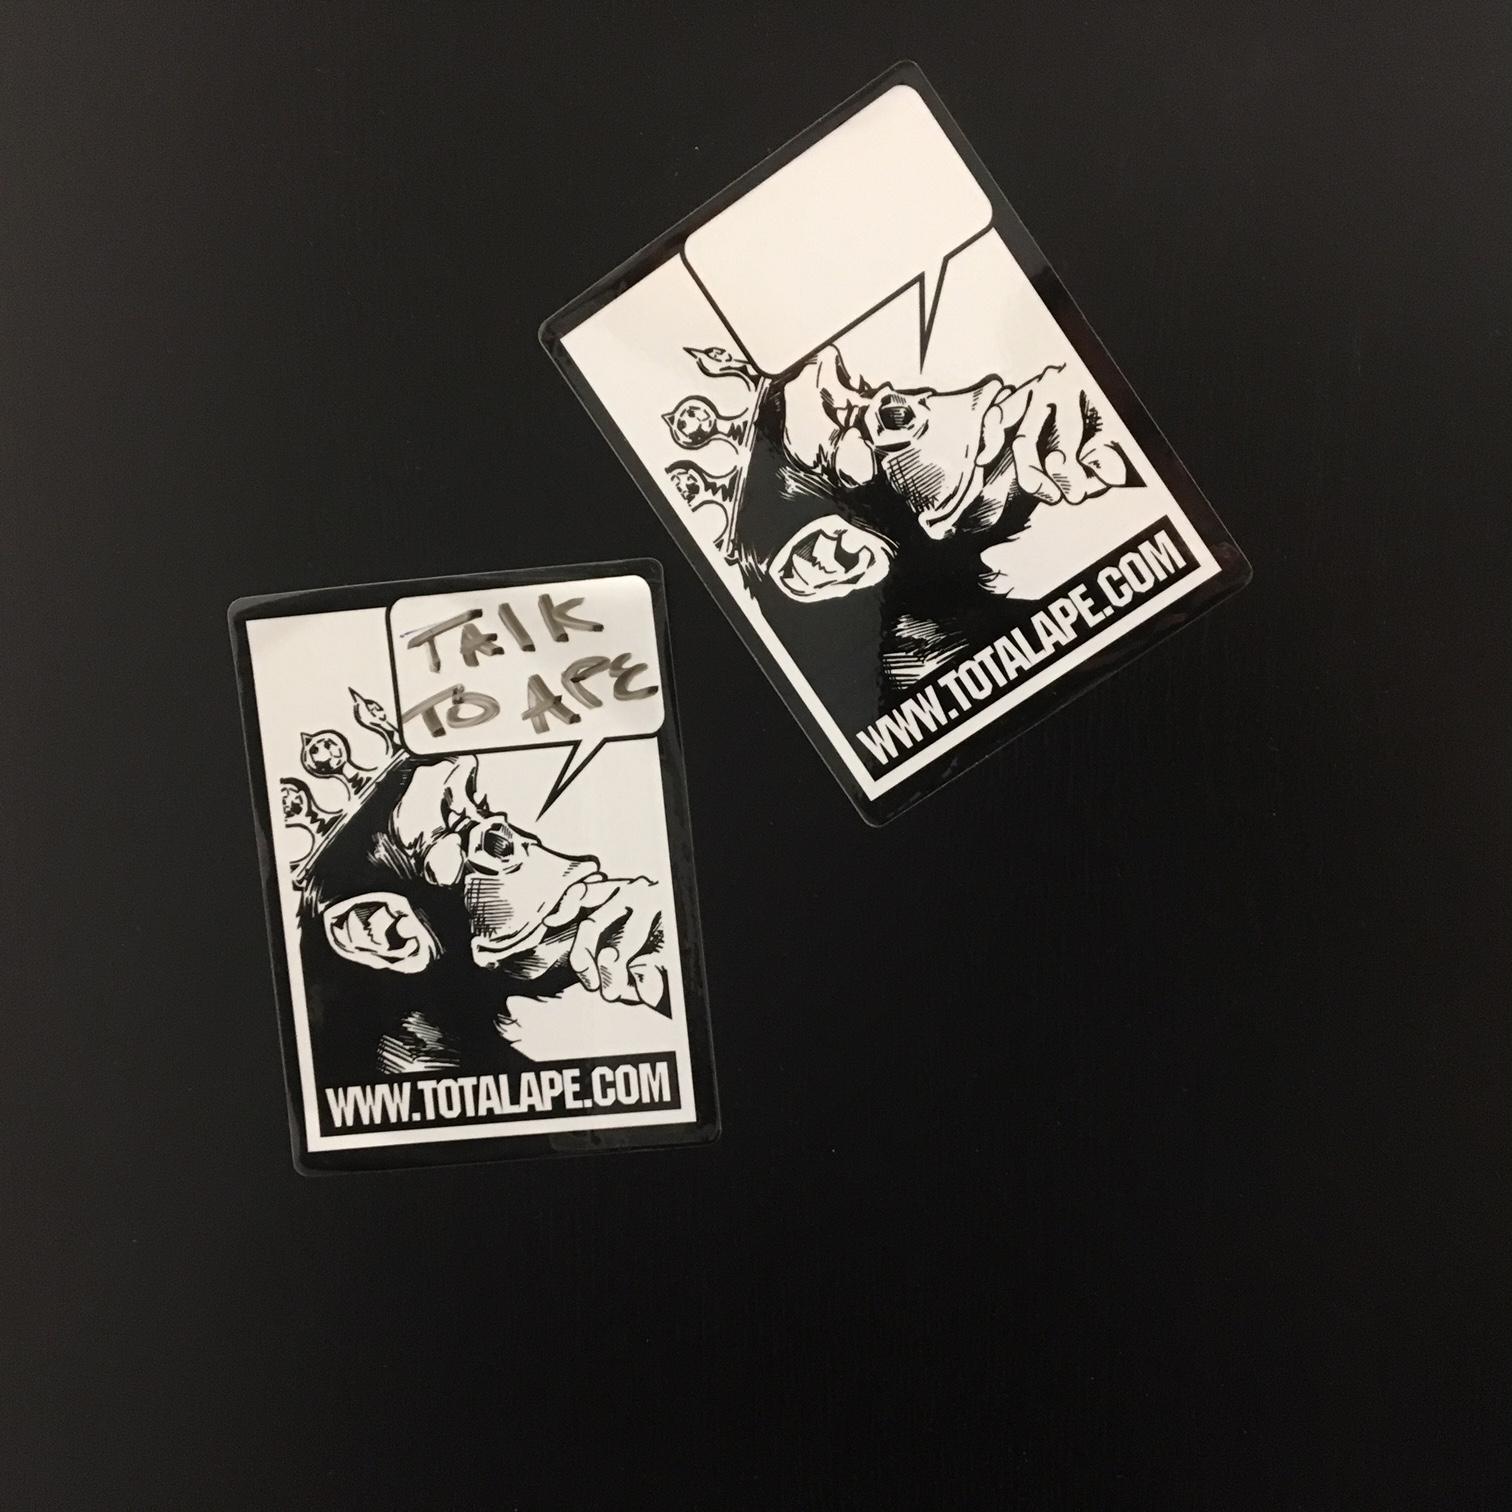 Sticker tagging